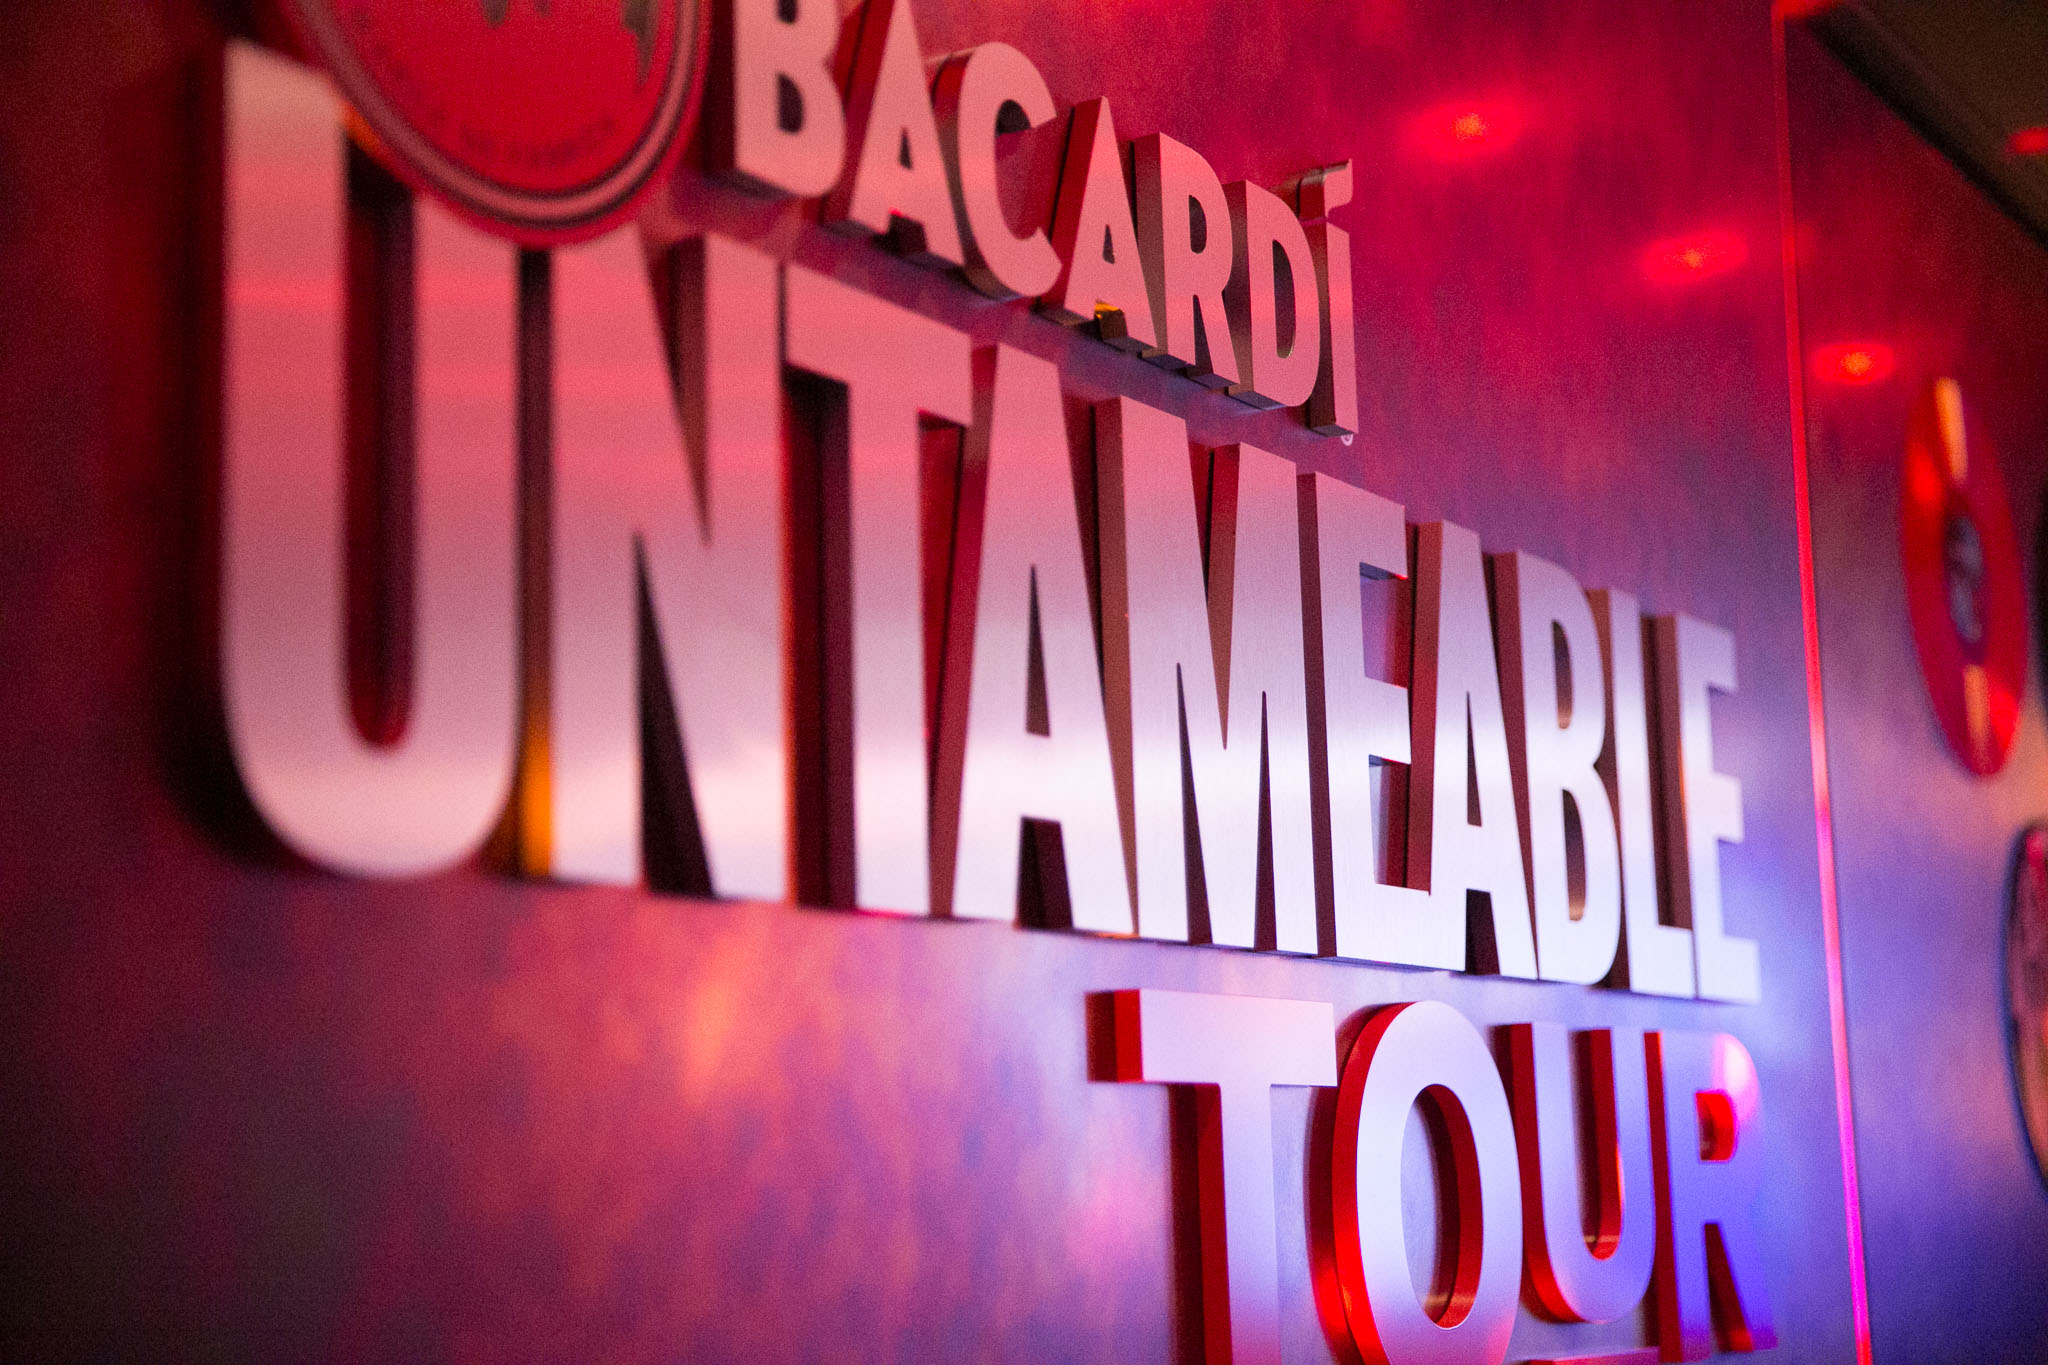 BacardiTour-150605-1213-1103.jpg